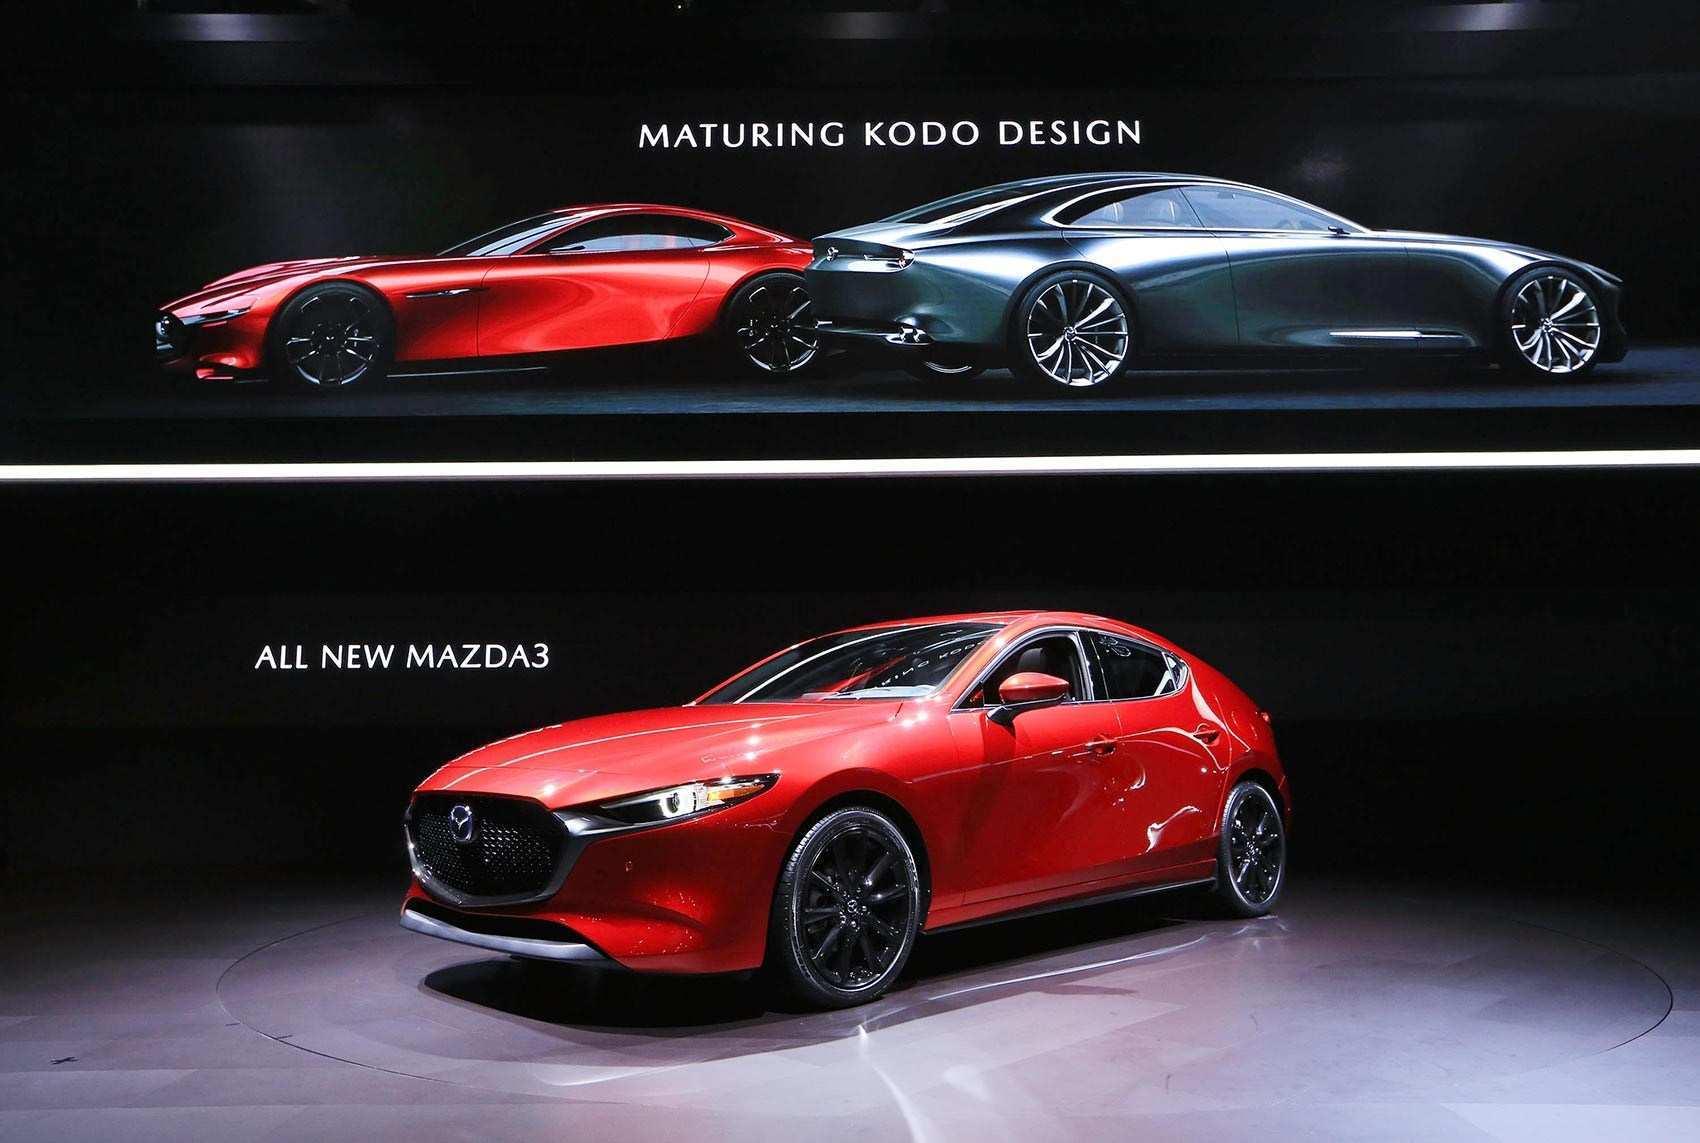 15 Best Review New Mazda Kodo 2019 Release Date Performance and New Engine for New Mazda Kodo 2019 Release Date